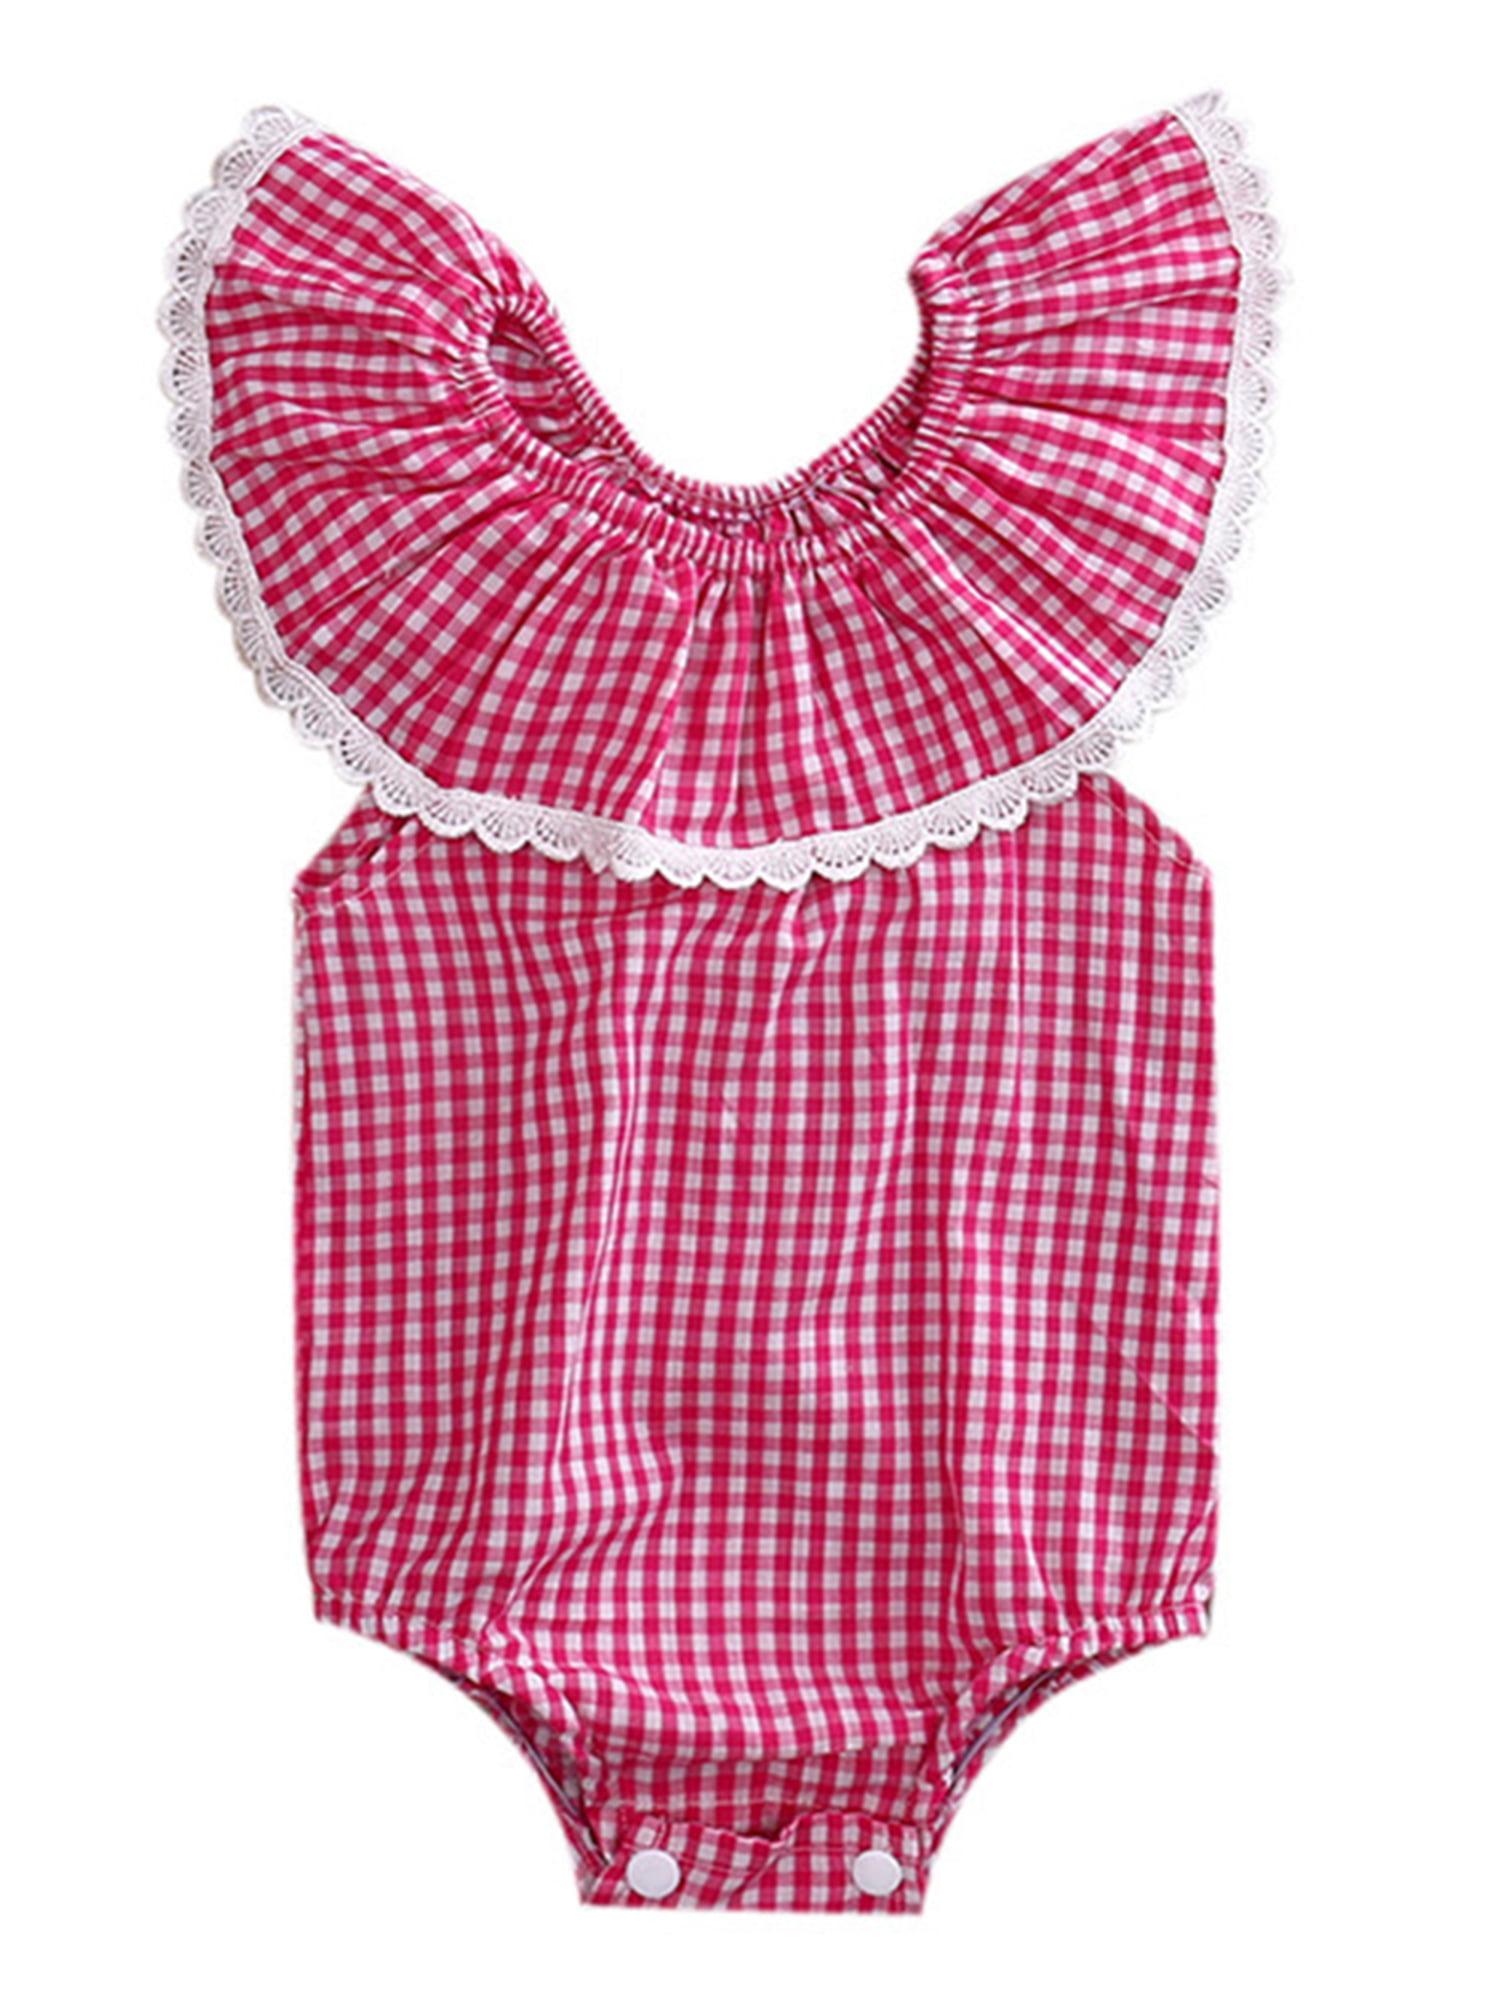 StylesILove Baby Girl Plaid Print Lace Lotus Collar Off Shoulder Bodysuit Romper (100/18-24 Months)